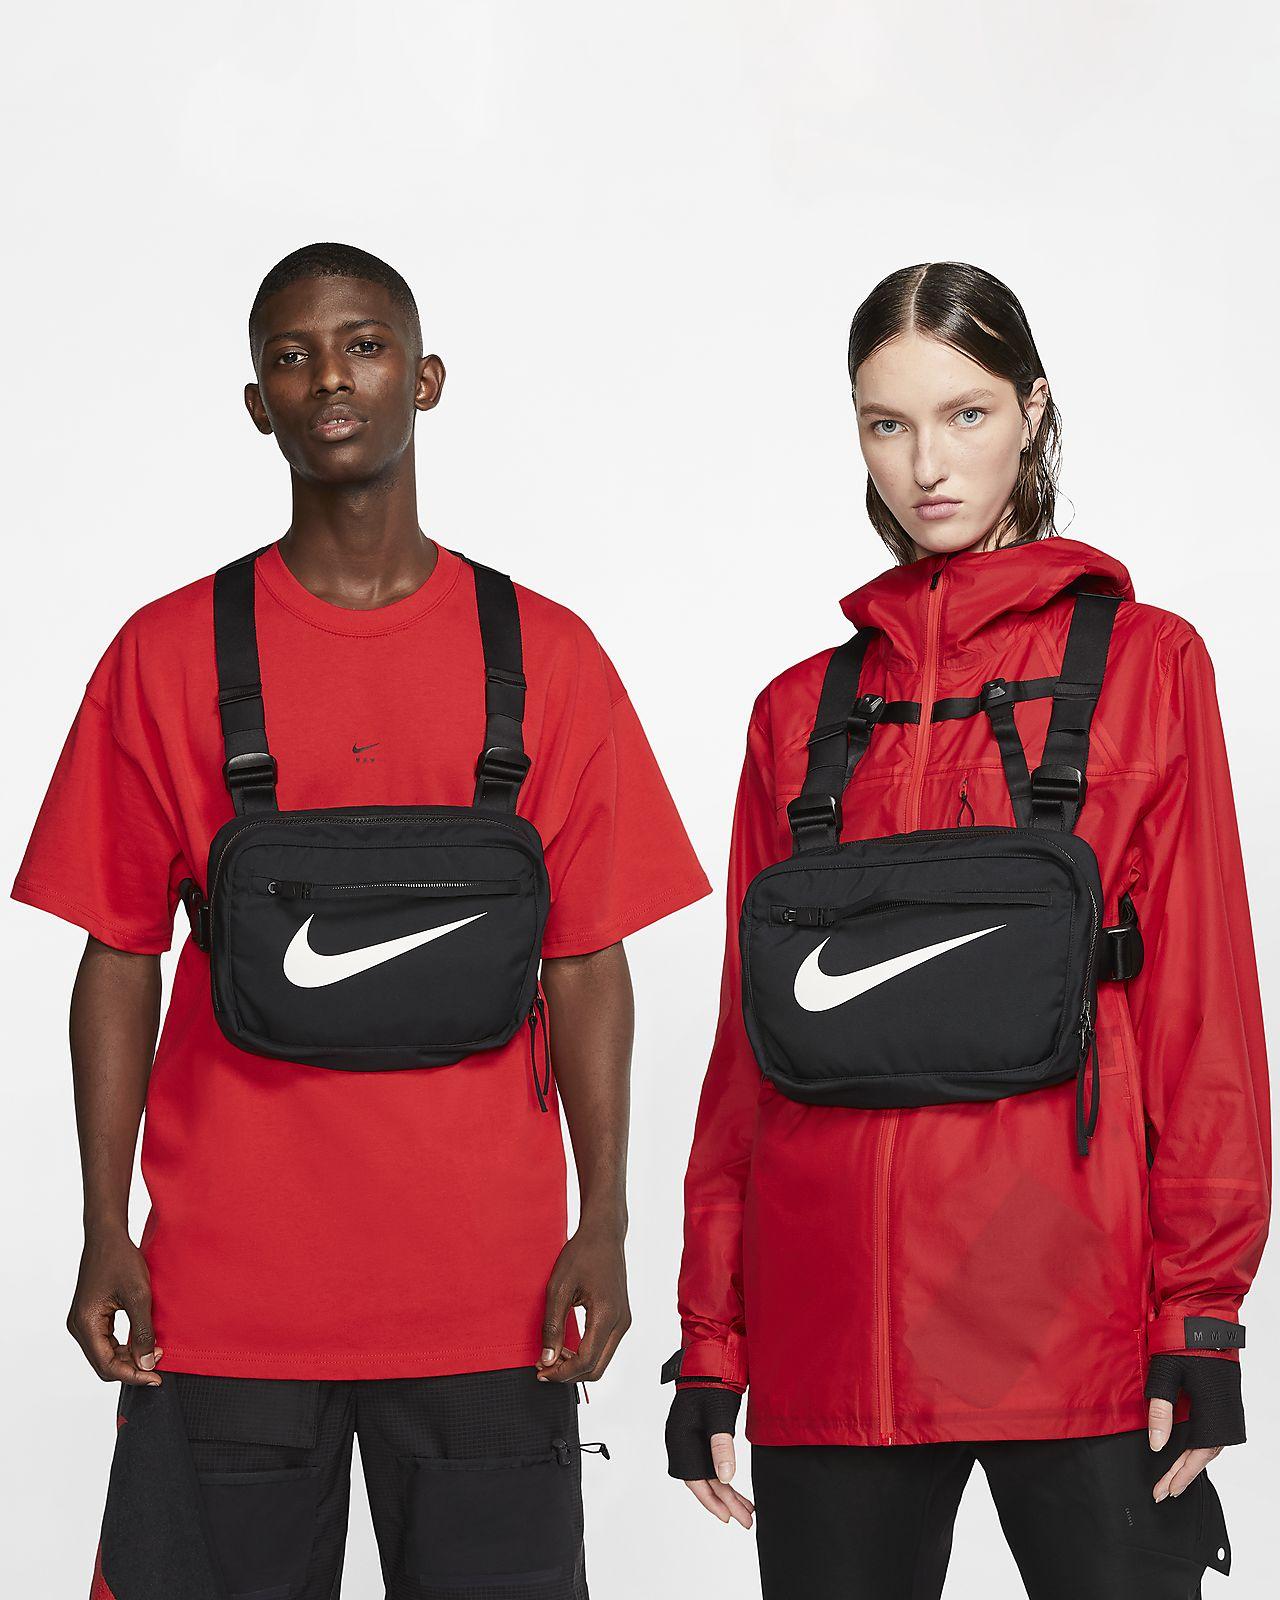 Nike x MMW Chest Rig